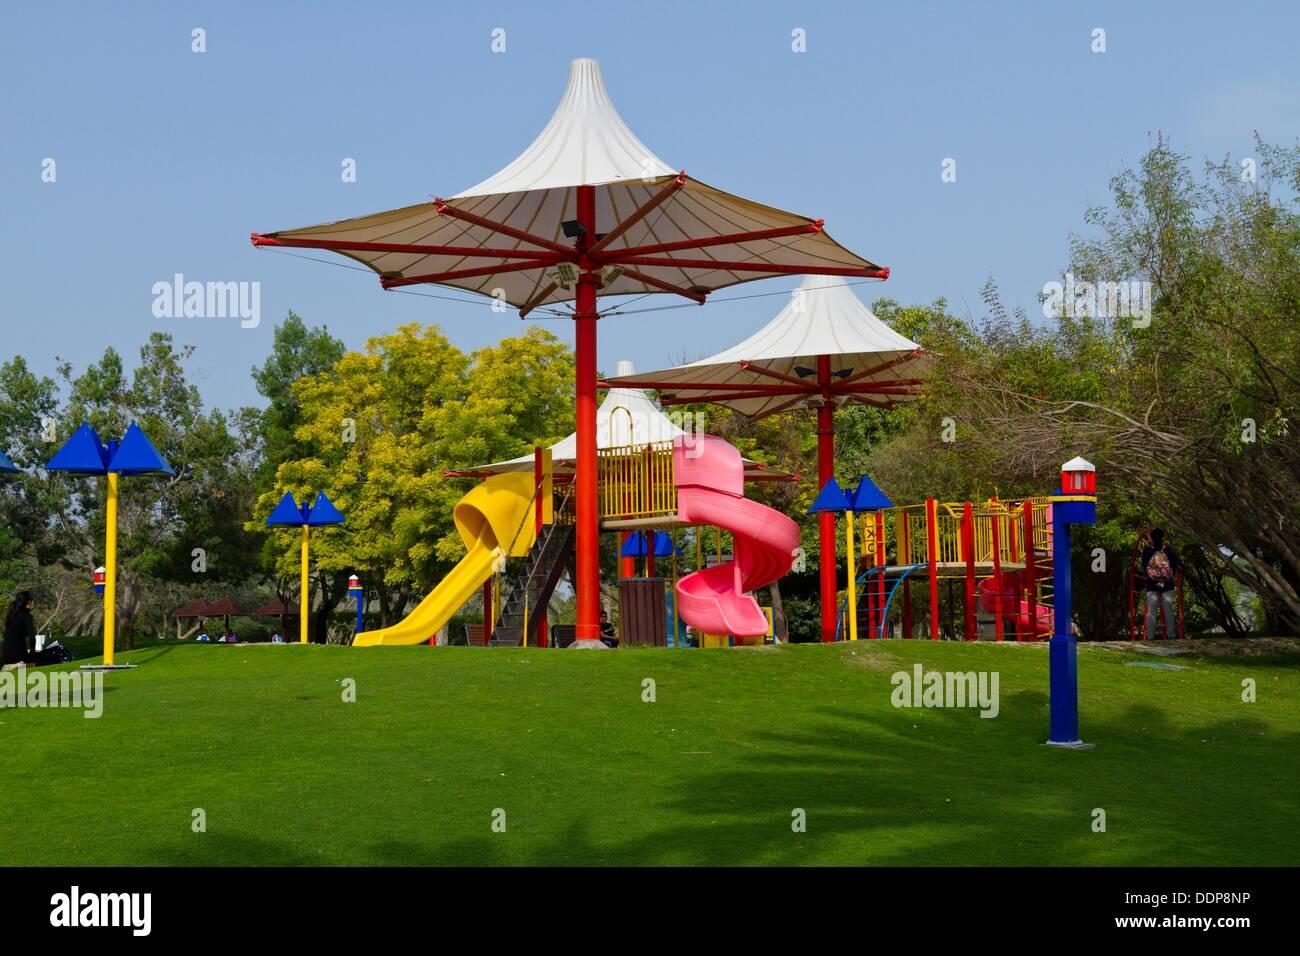 Ihram Kids For Sale Dubai: Children´s Playground In Creek Park, Dubai, UAE Stock